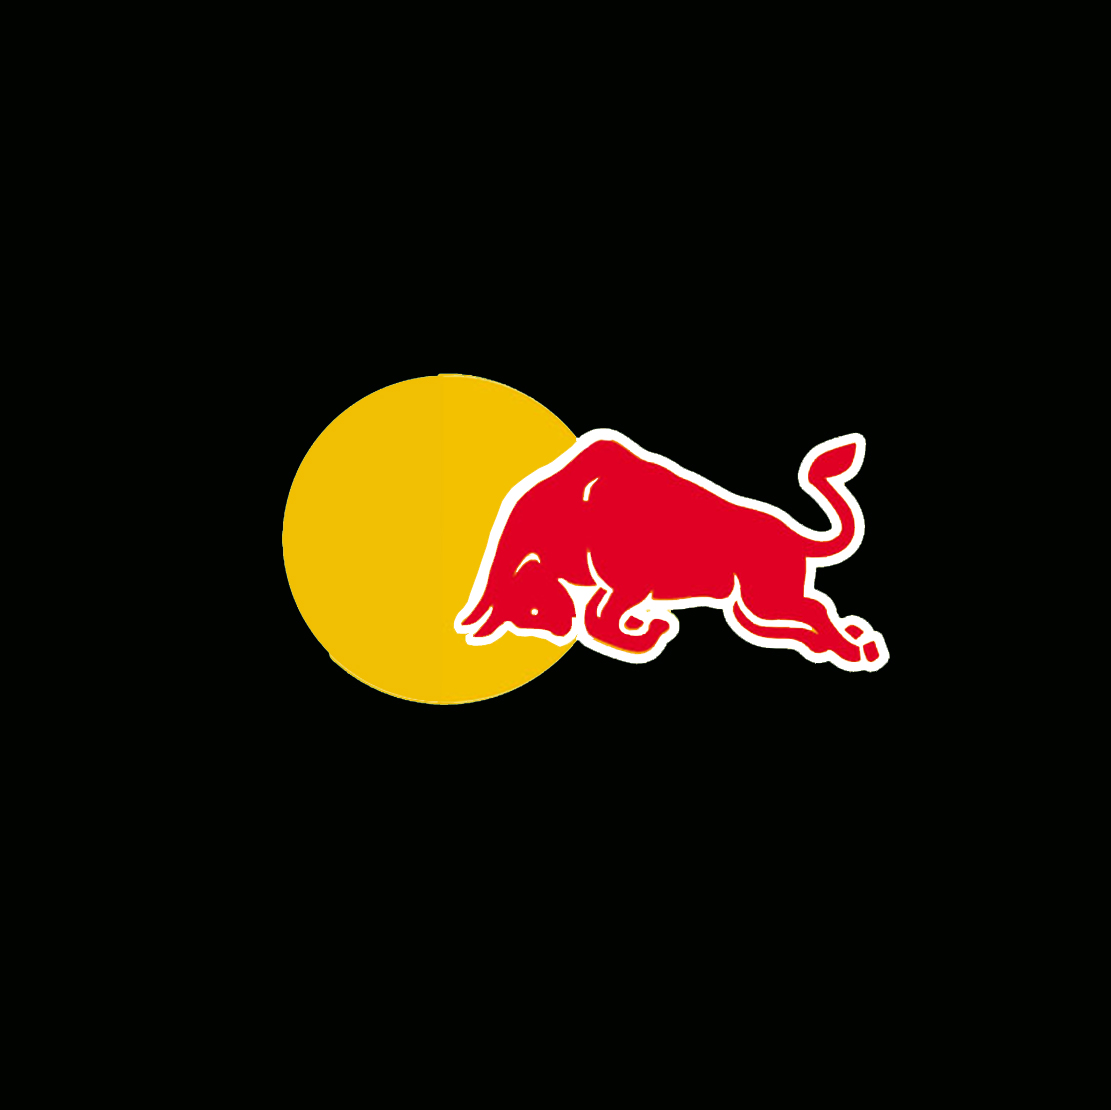 half sun red bull logo pictures newschoolerscom